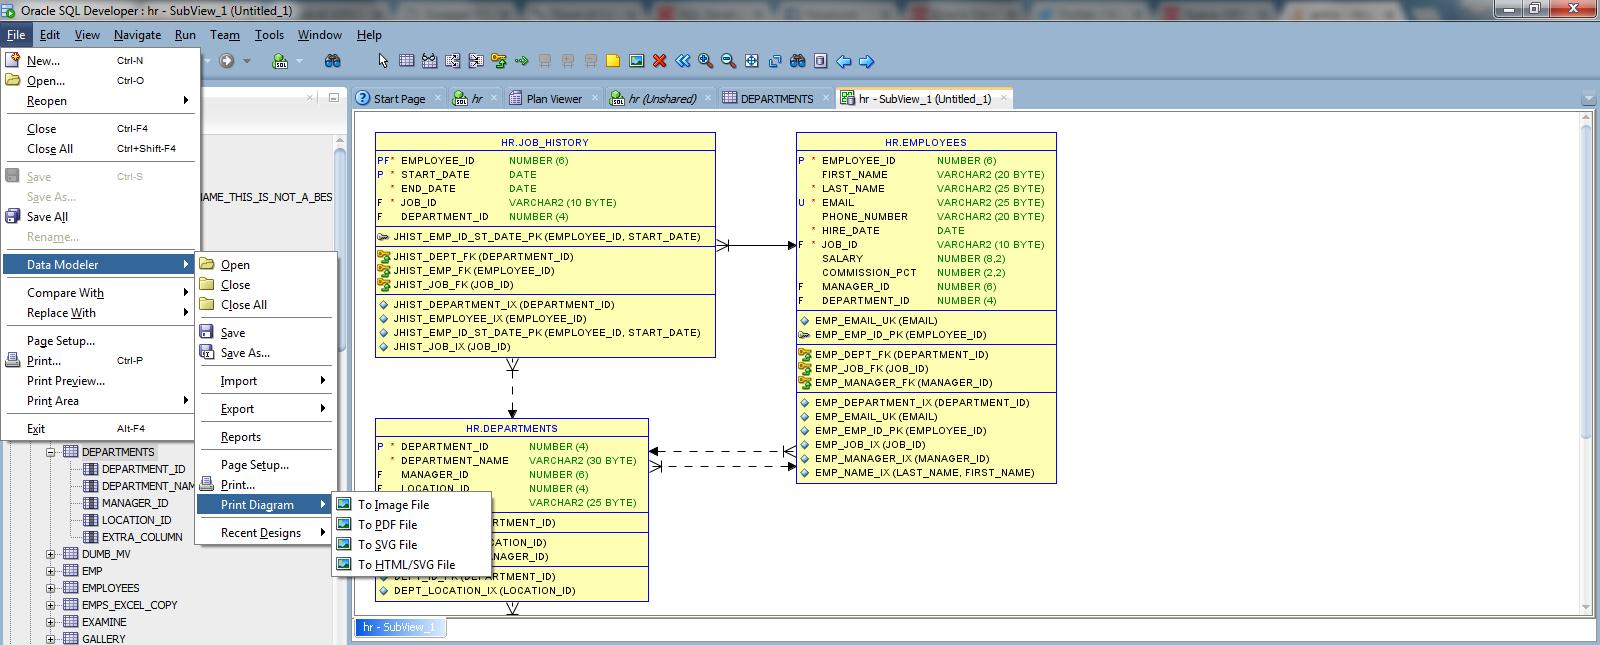 How To Export Erd Diagram To Image In Oracle Data Modeler throughout Er Diagram Using Sql Developer